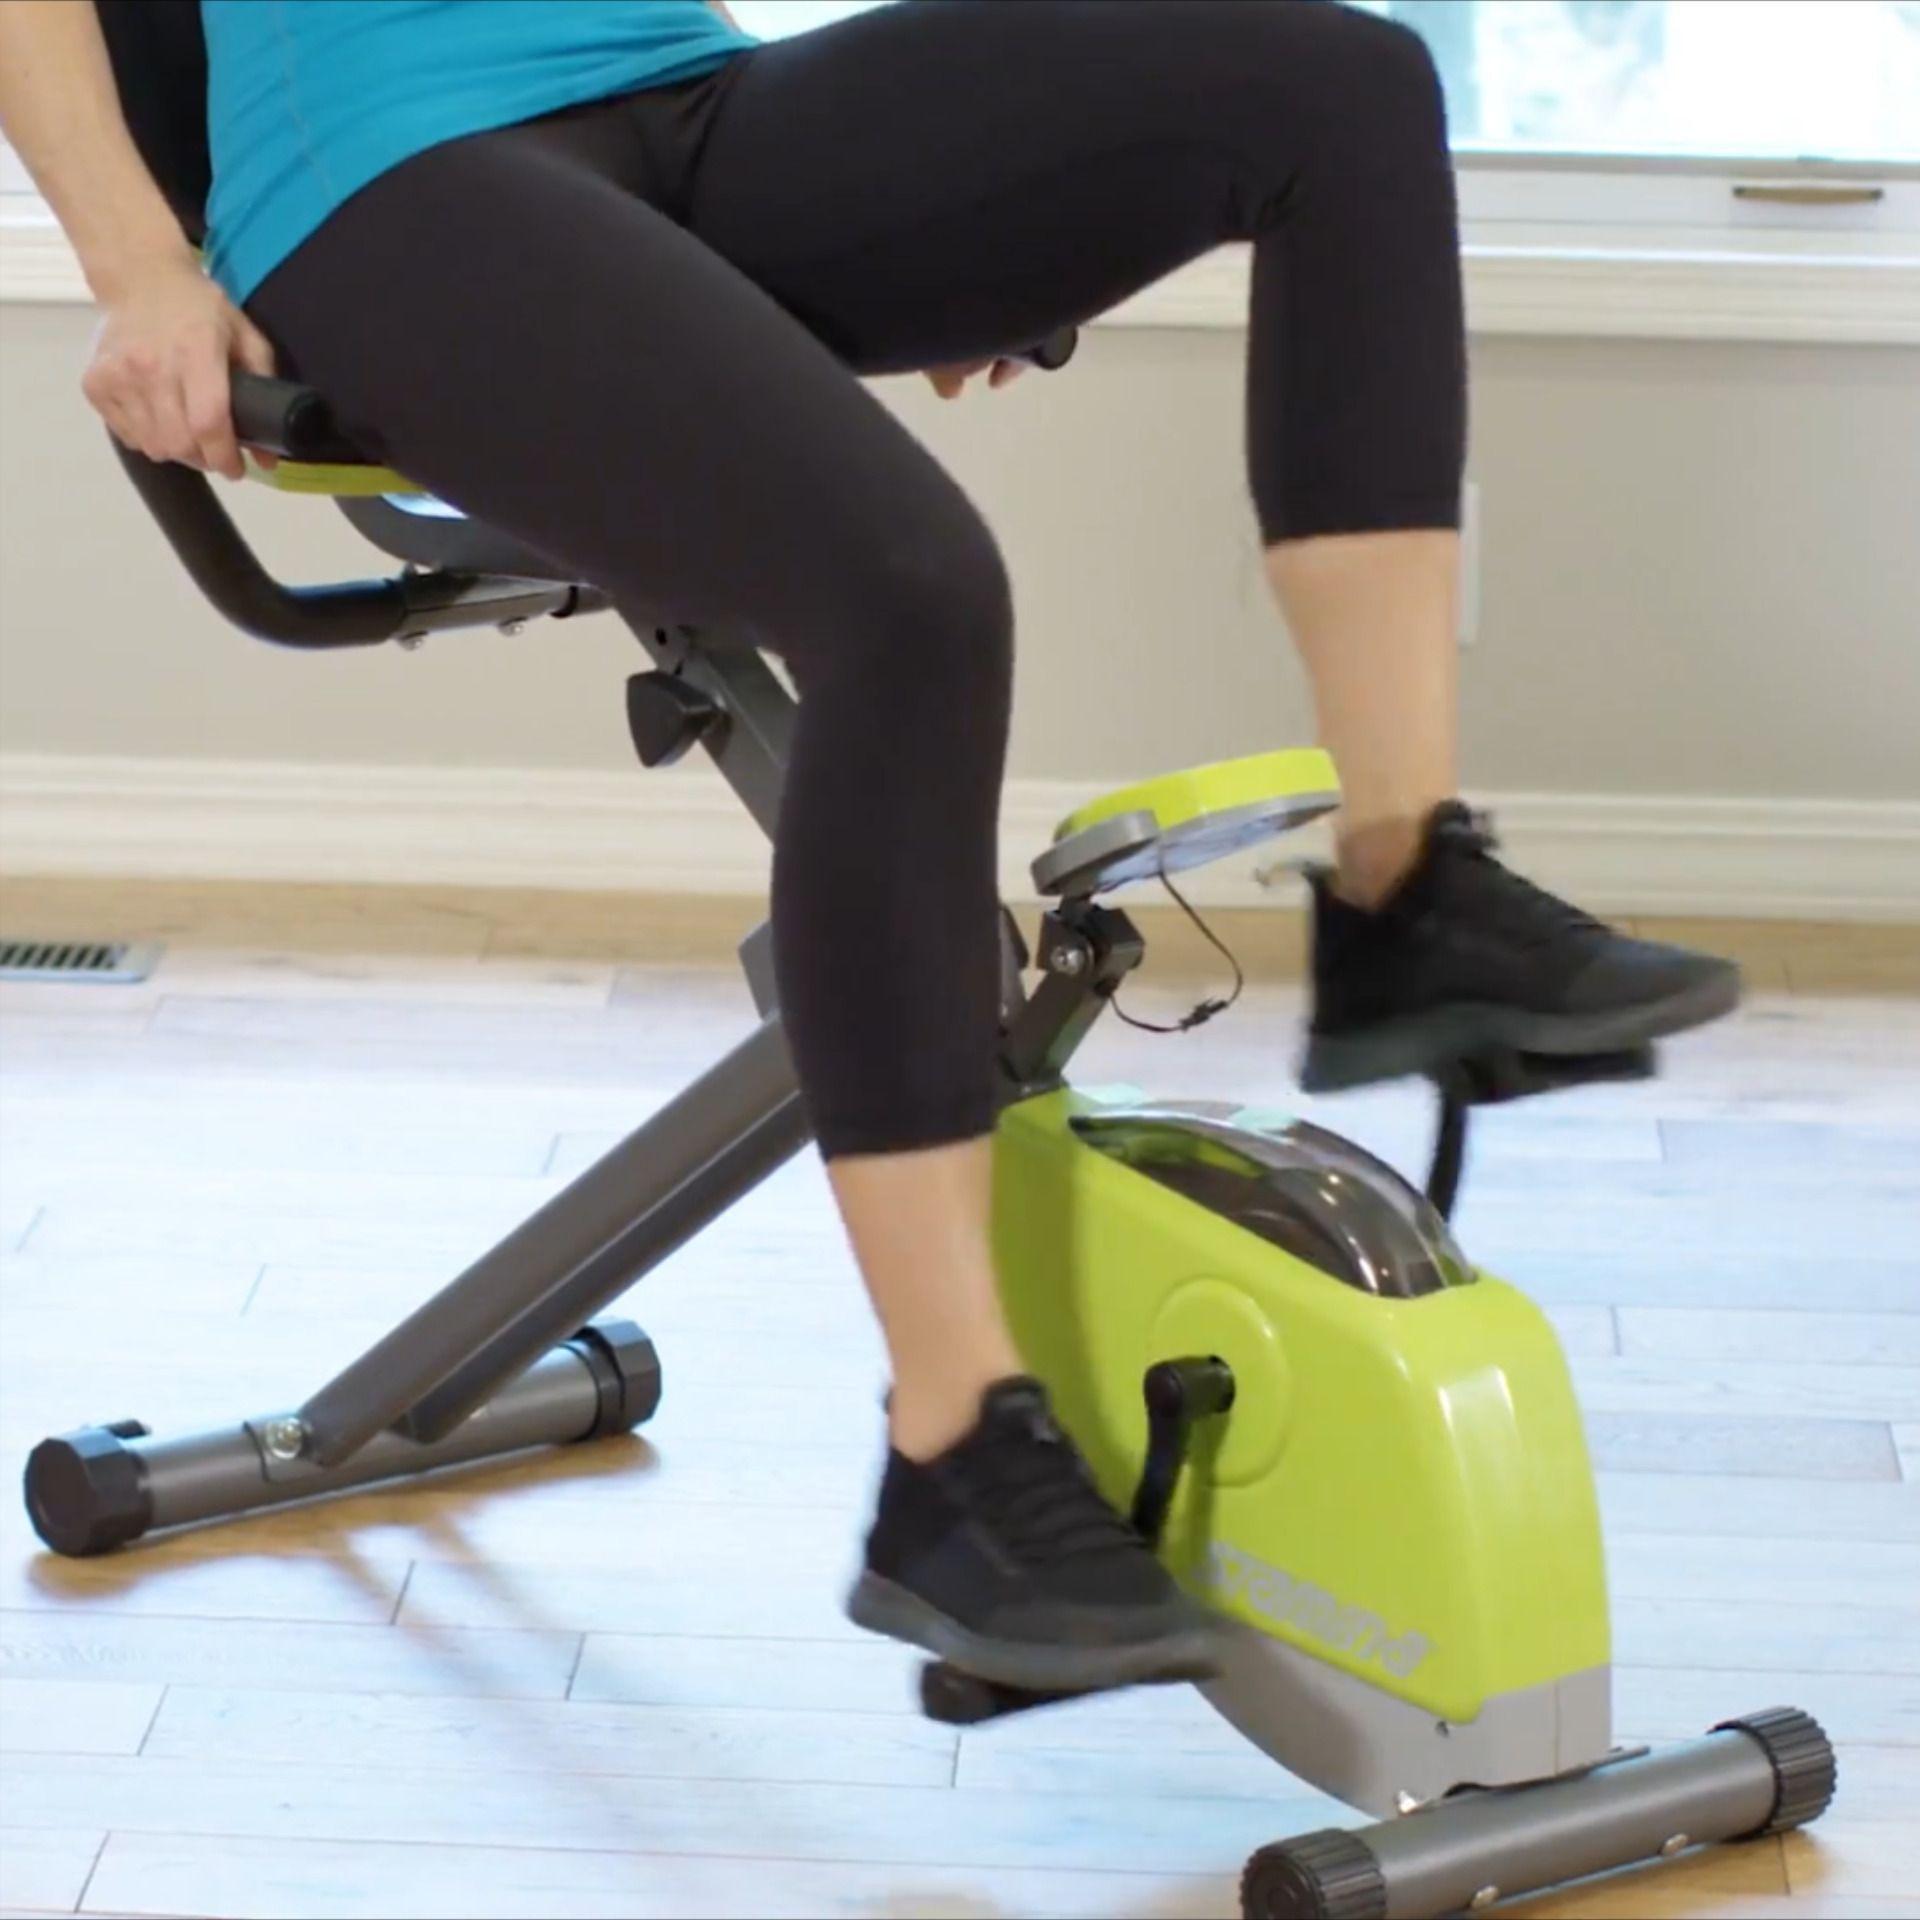 Stamina 4655 Recumbent Air Bike Biking Workout Upright Exercise Bike Cycling Workout